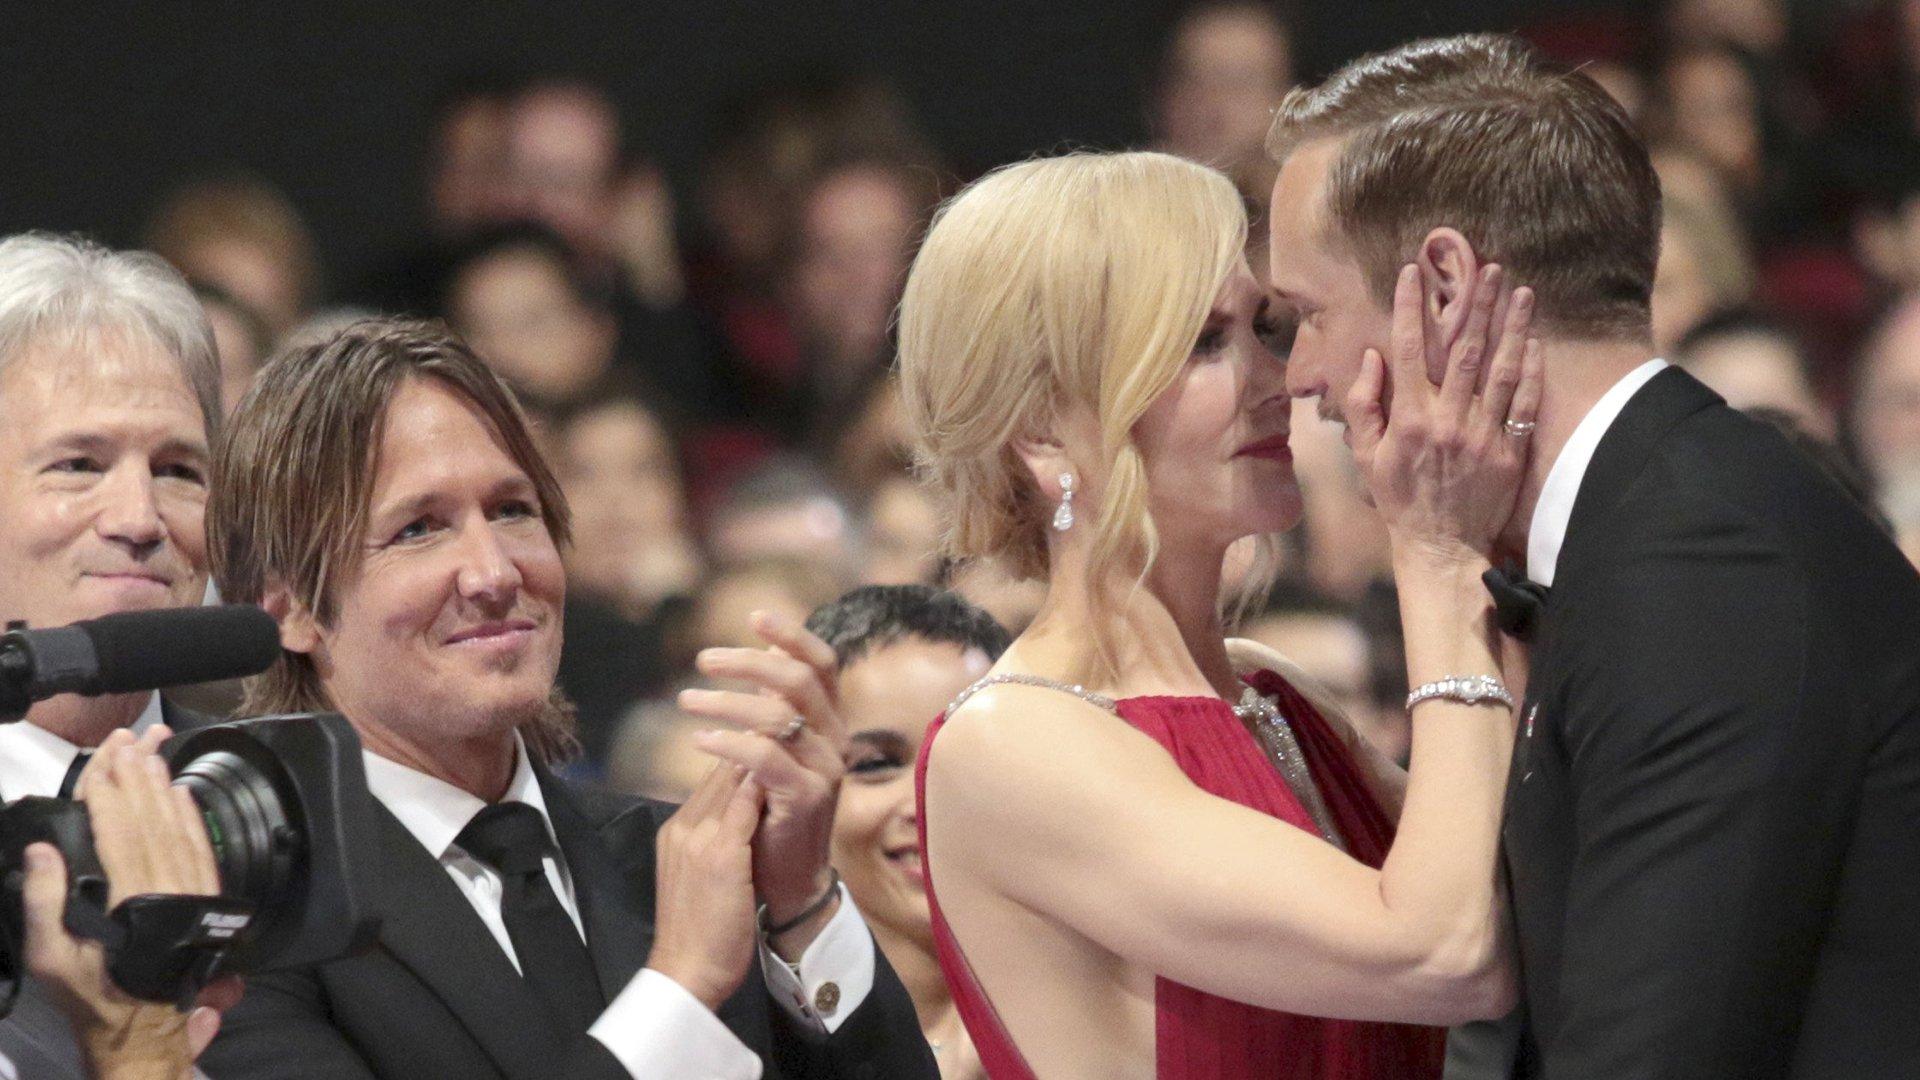 Calm down! Nicole Kidman kisses everyone on the lips https://t.co/yMH3lxPdHg https://t.co/2pP4QP1ONs